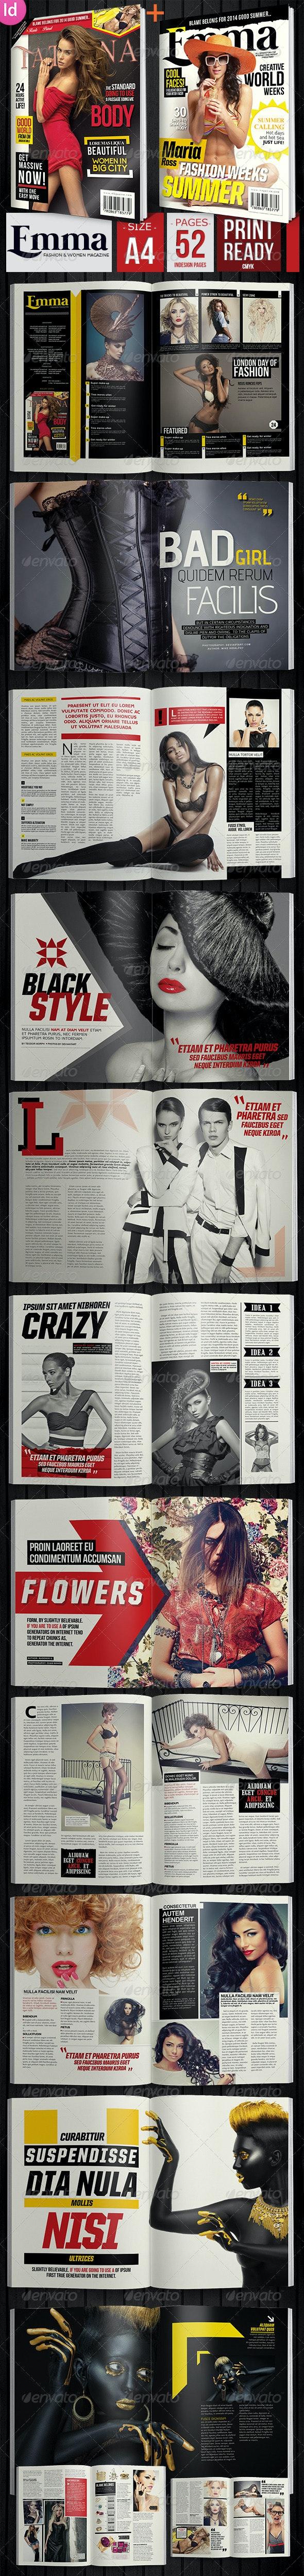 Emma Fashion Magazine + 2 Covers - Magazines Print Templates